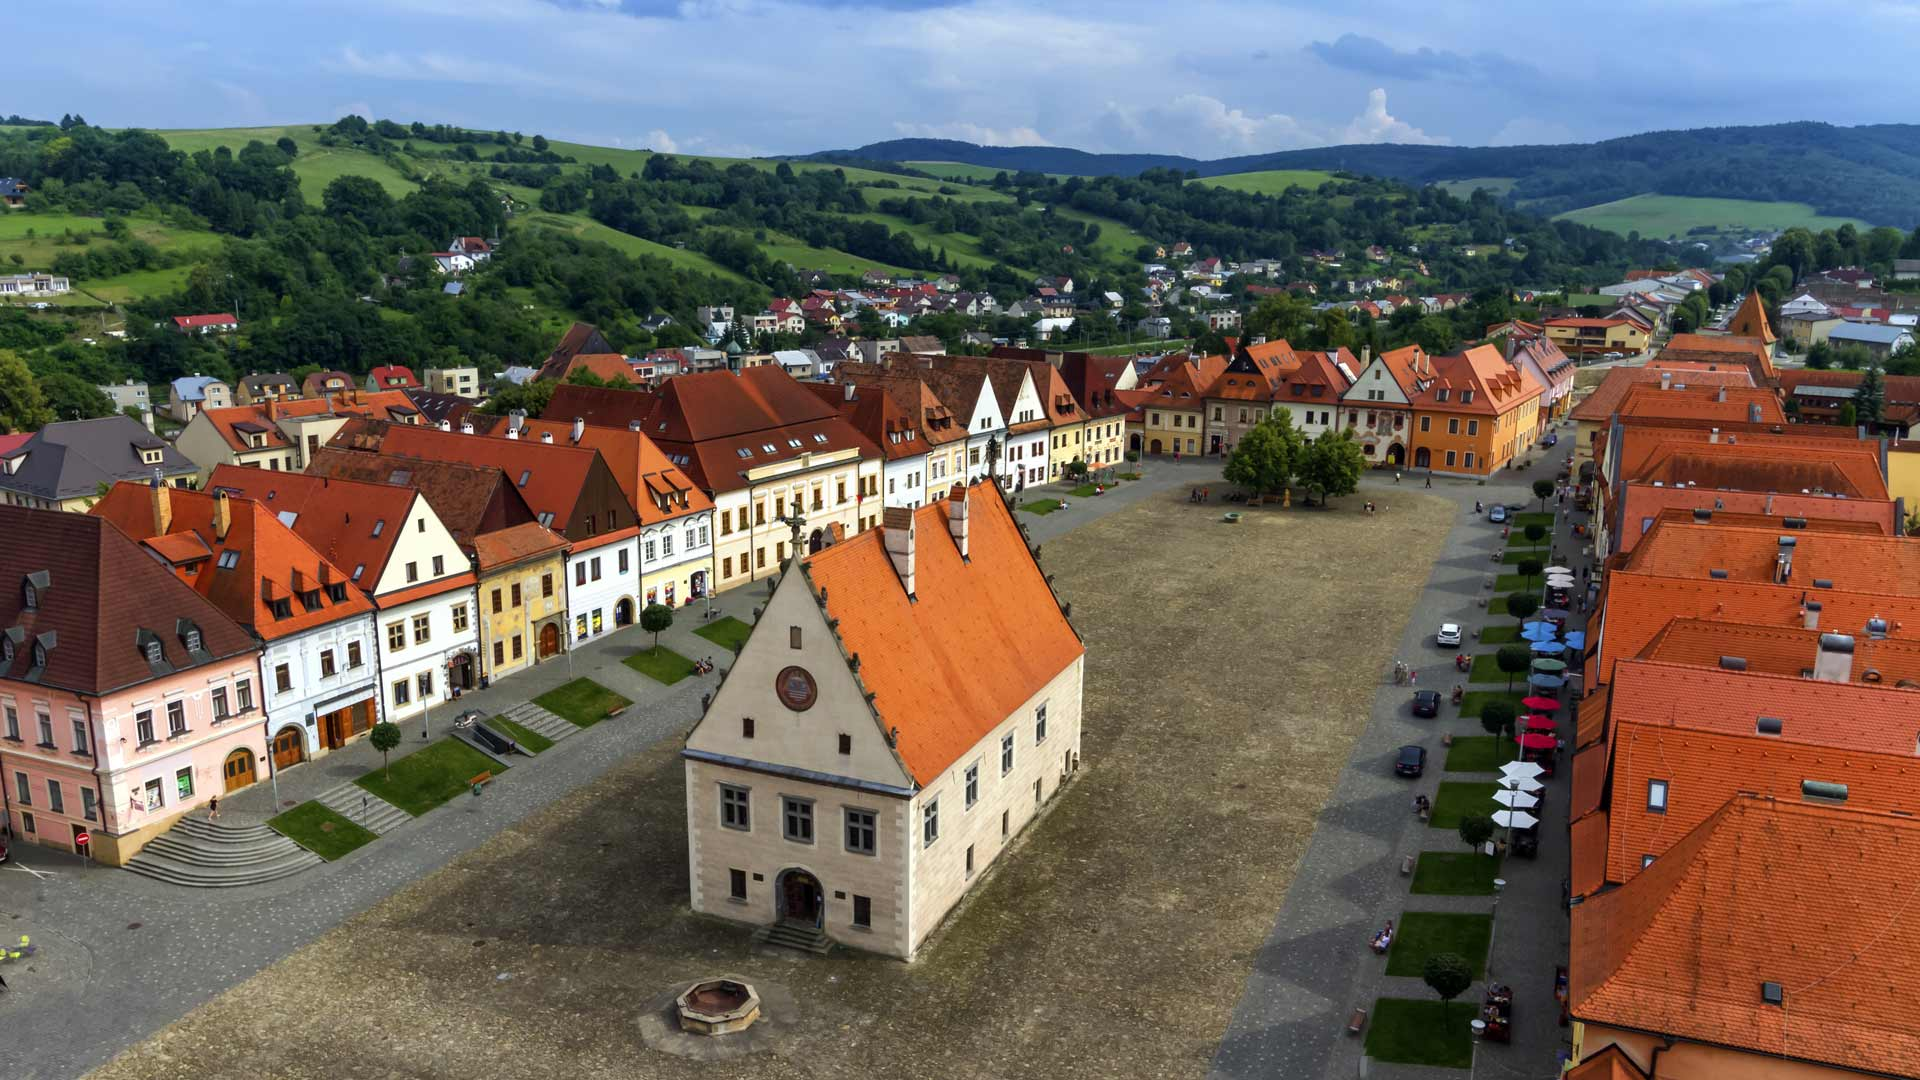 Old town square in Bardejov, Slovakia